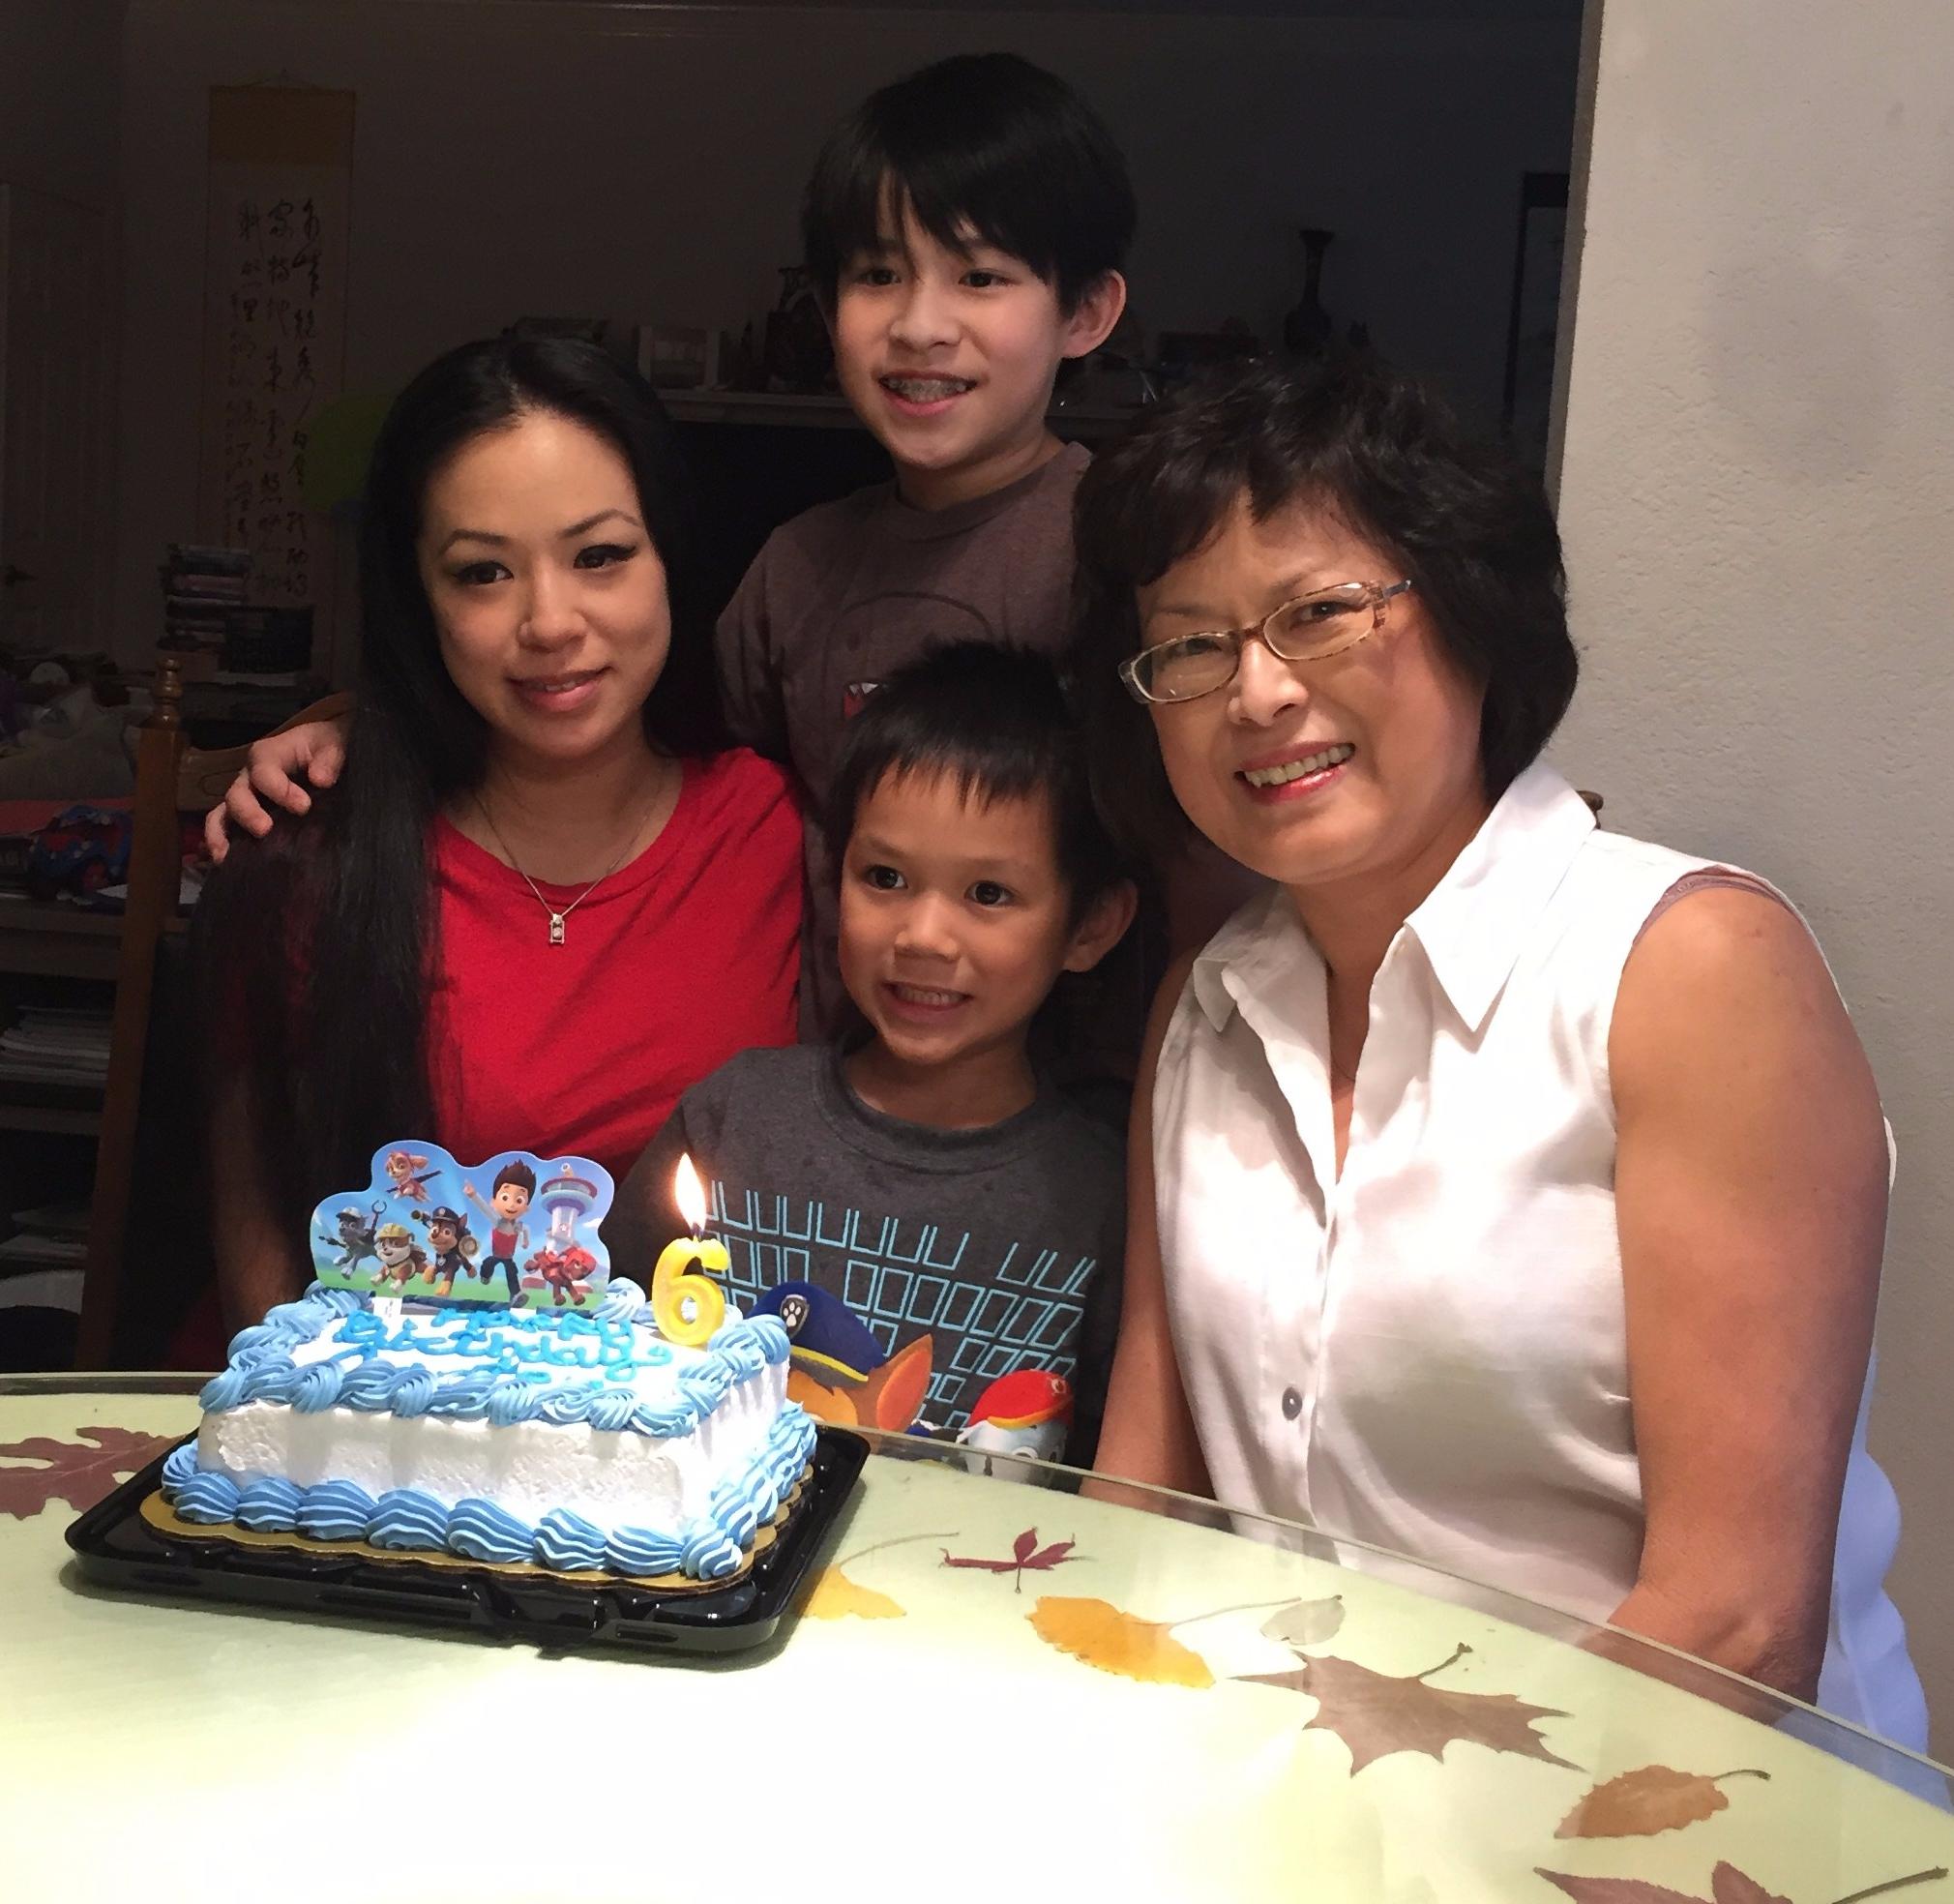 birthdays, nephew, six years old, celebrations, cake